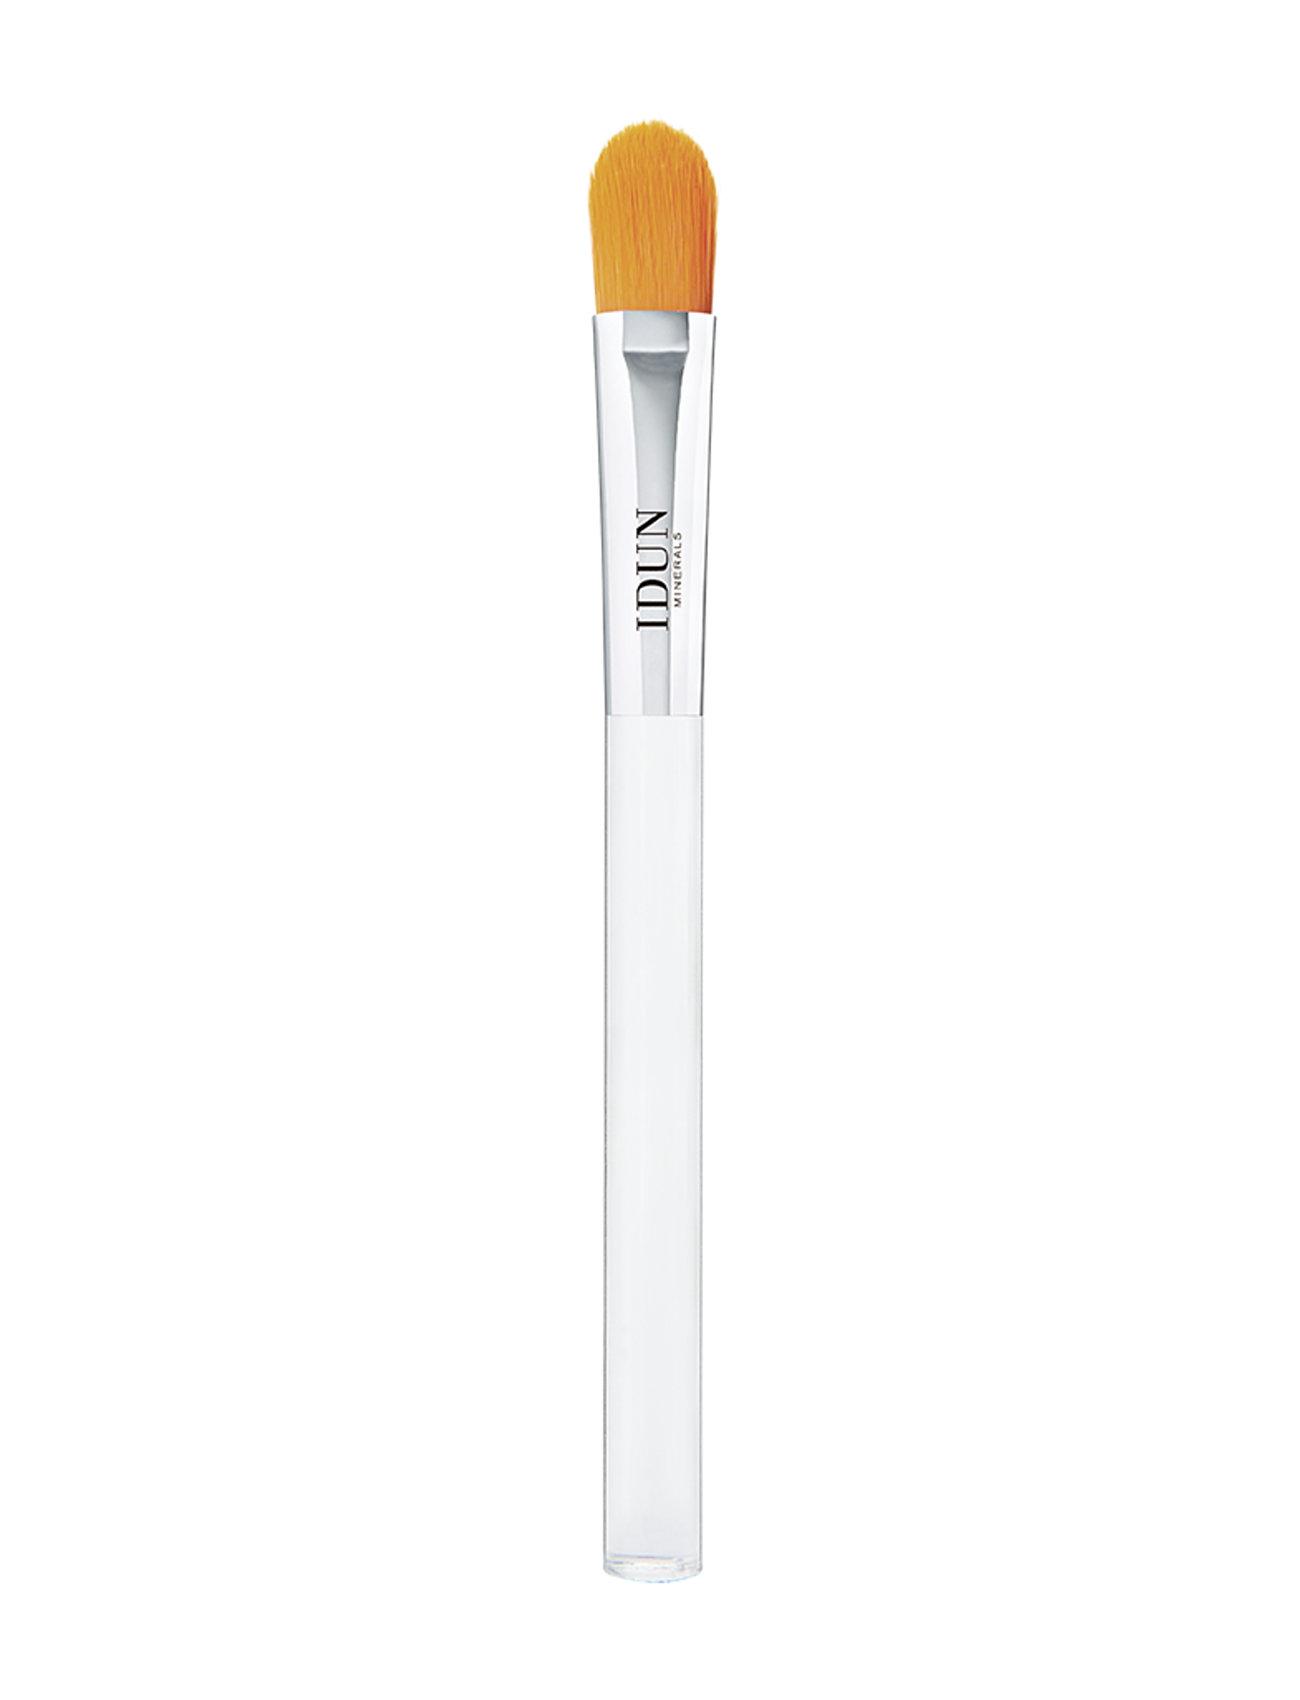 IDUN Minerals Concealer Brush - CLEAR